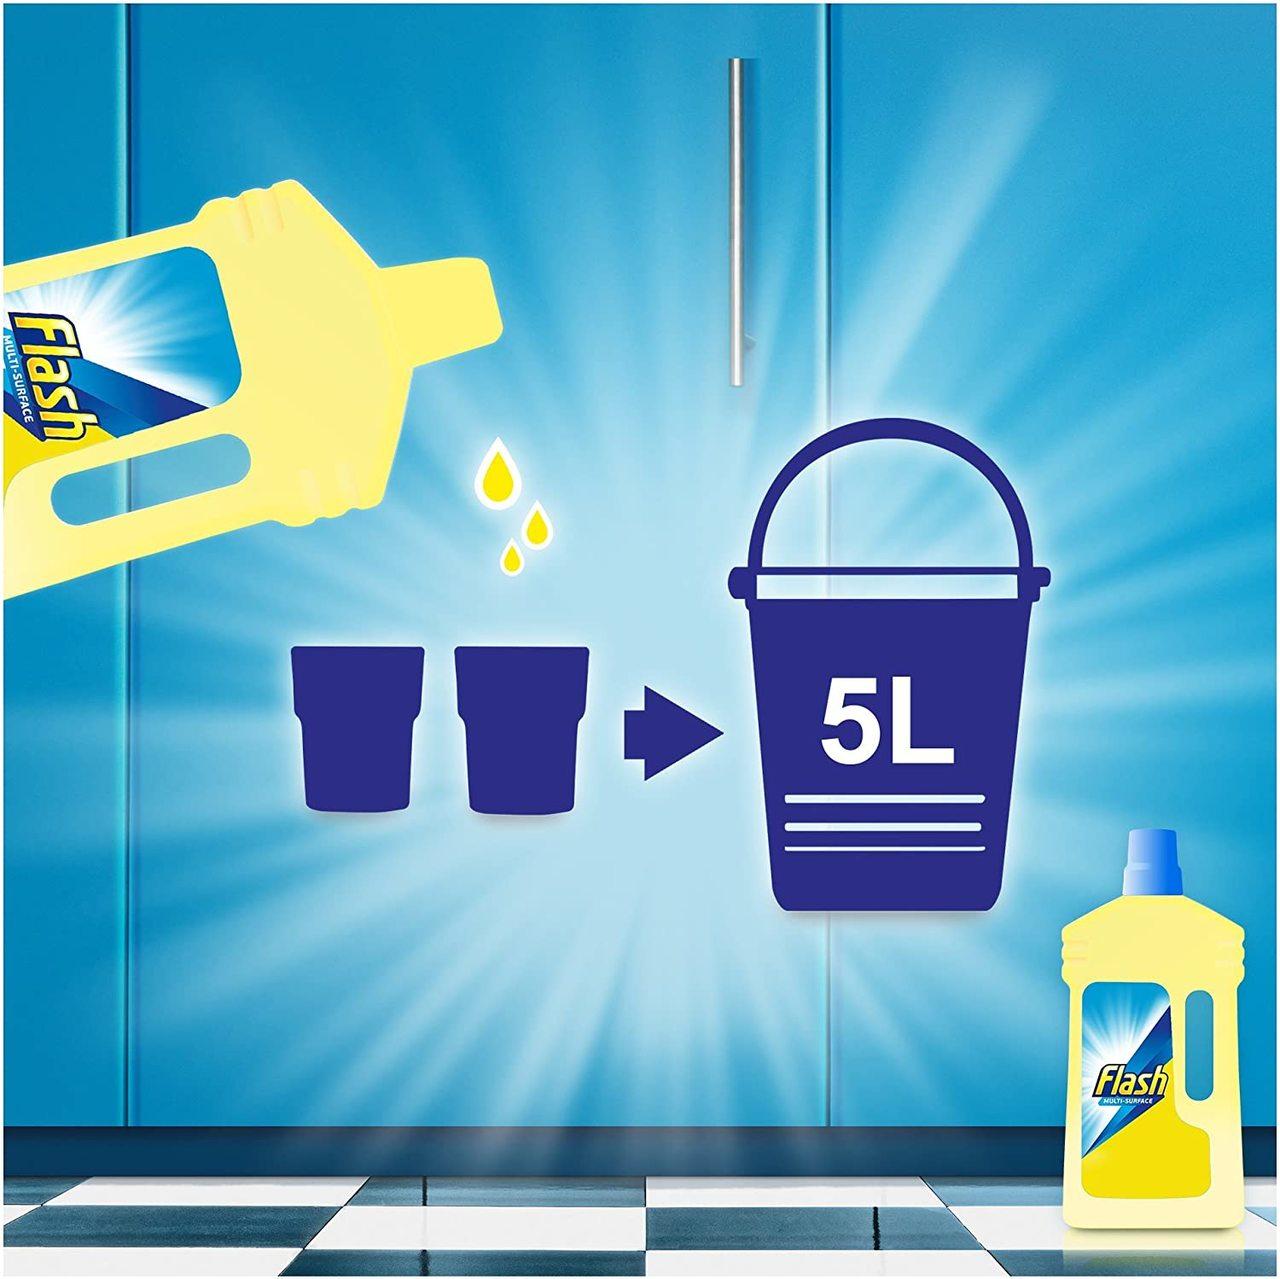 FLASH ALL PURPOSE CLEANER LIQUID  CRISPS LEMON 2.05L